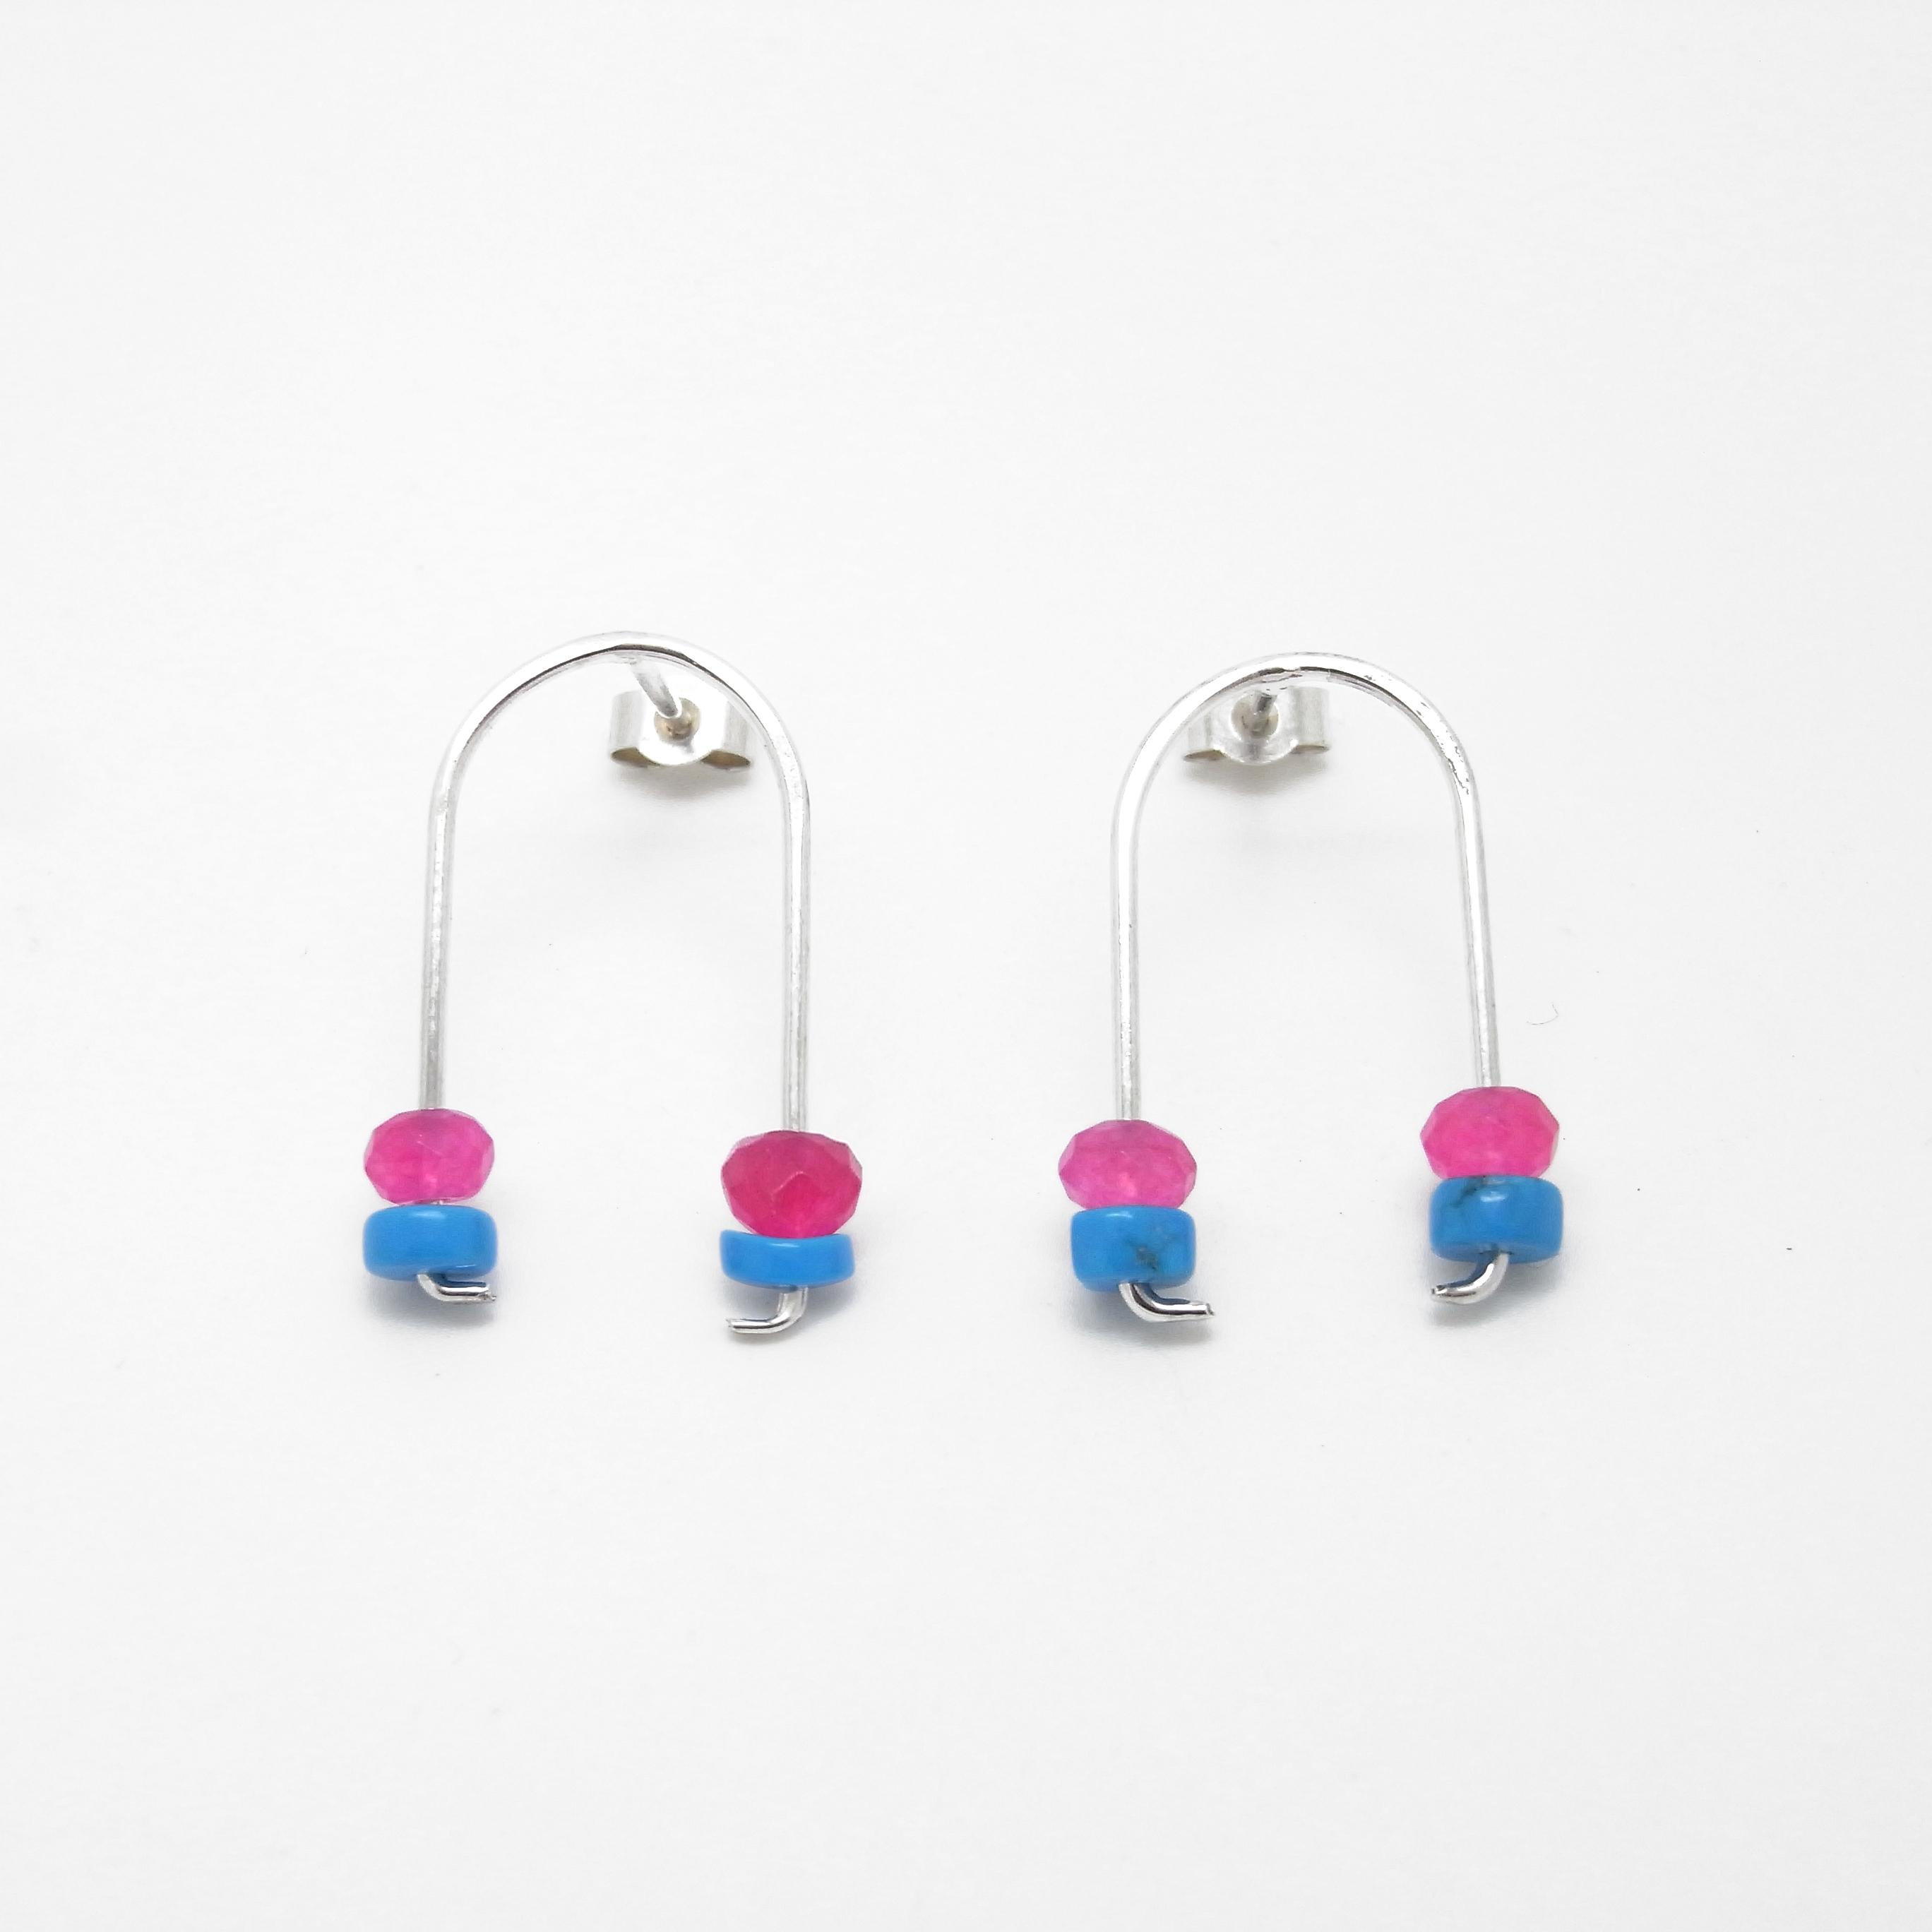 Wishbone Stud Earrings - Turquoise and Pink Agate